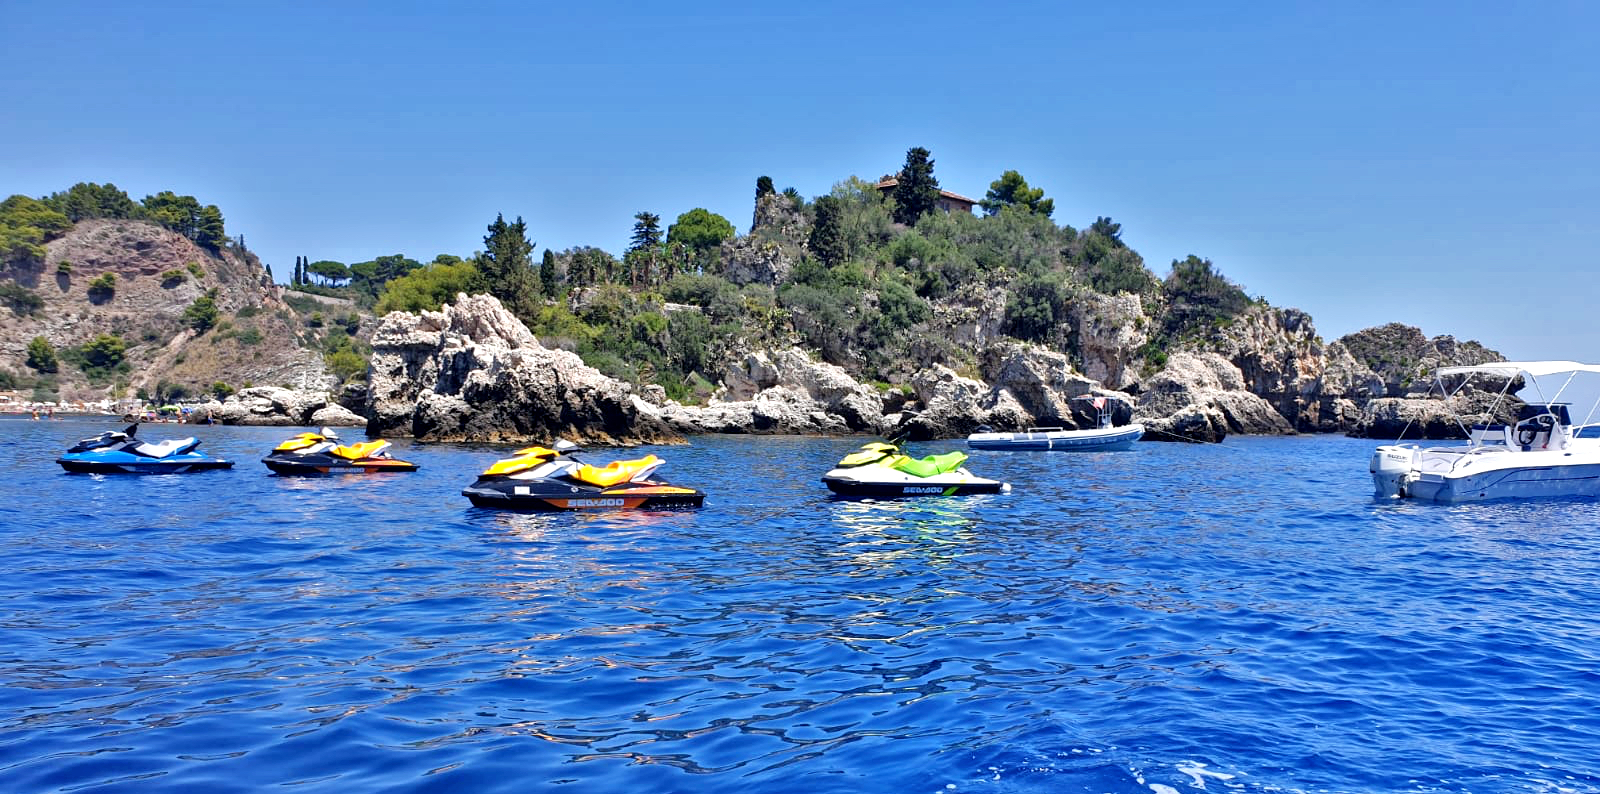 Noleggio moto d'acqua e barca - Taormina